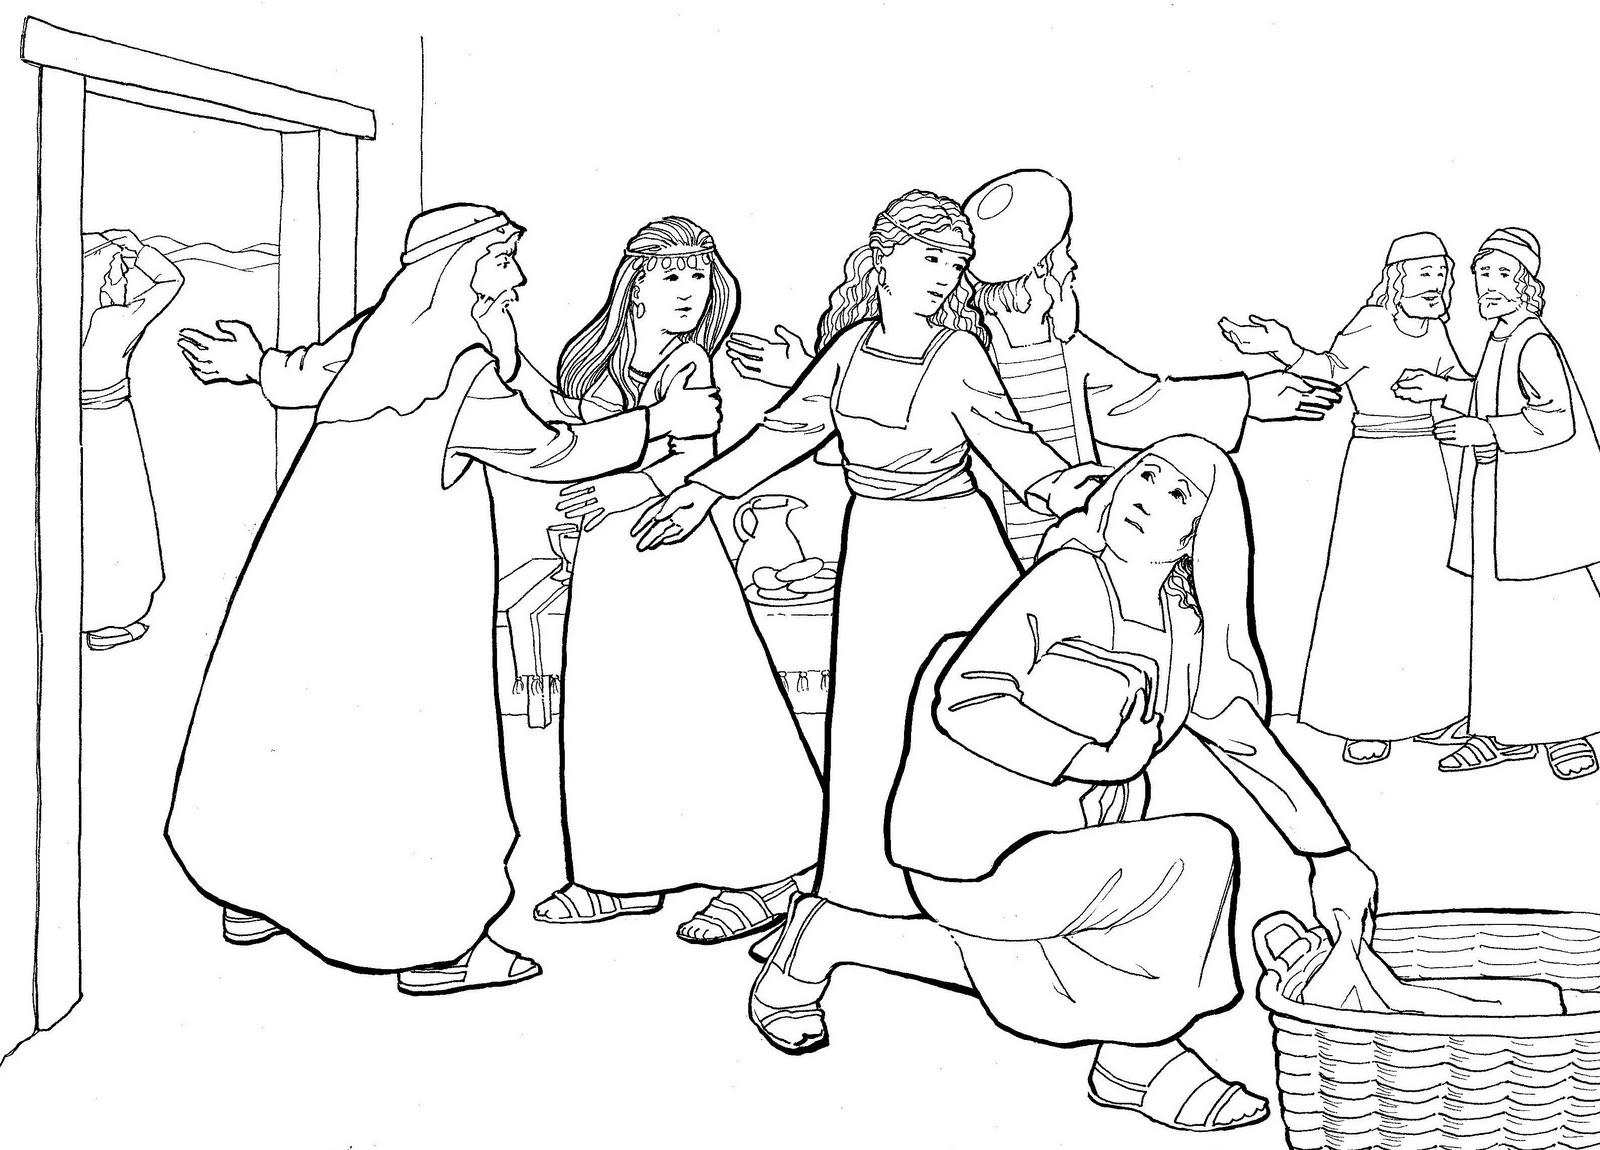 Make A Joyful Color Bible Illustrating